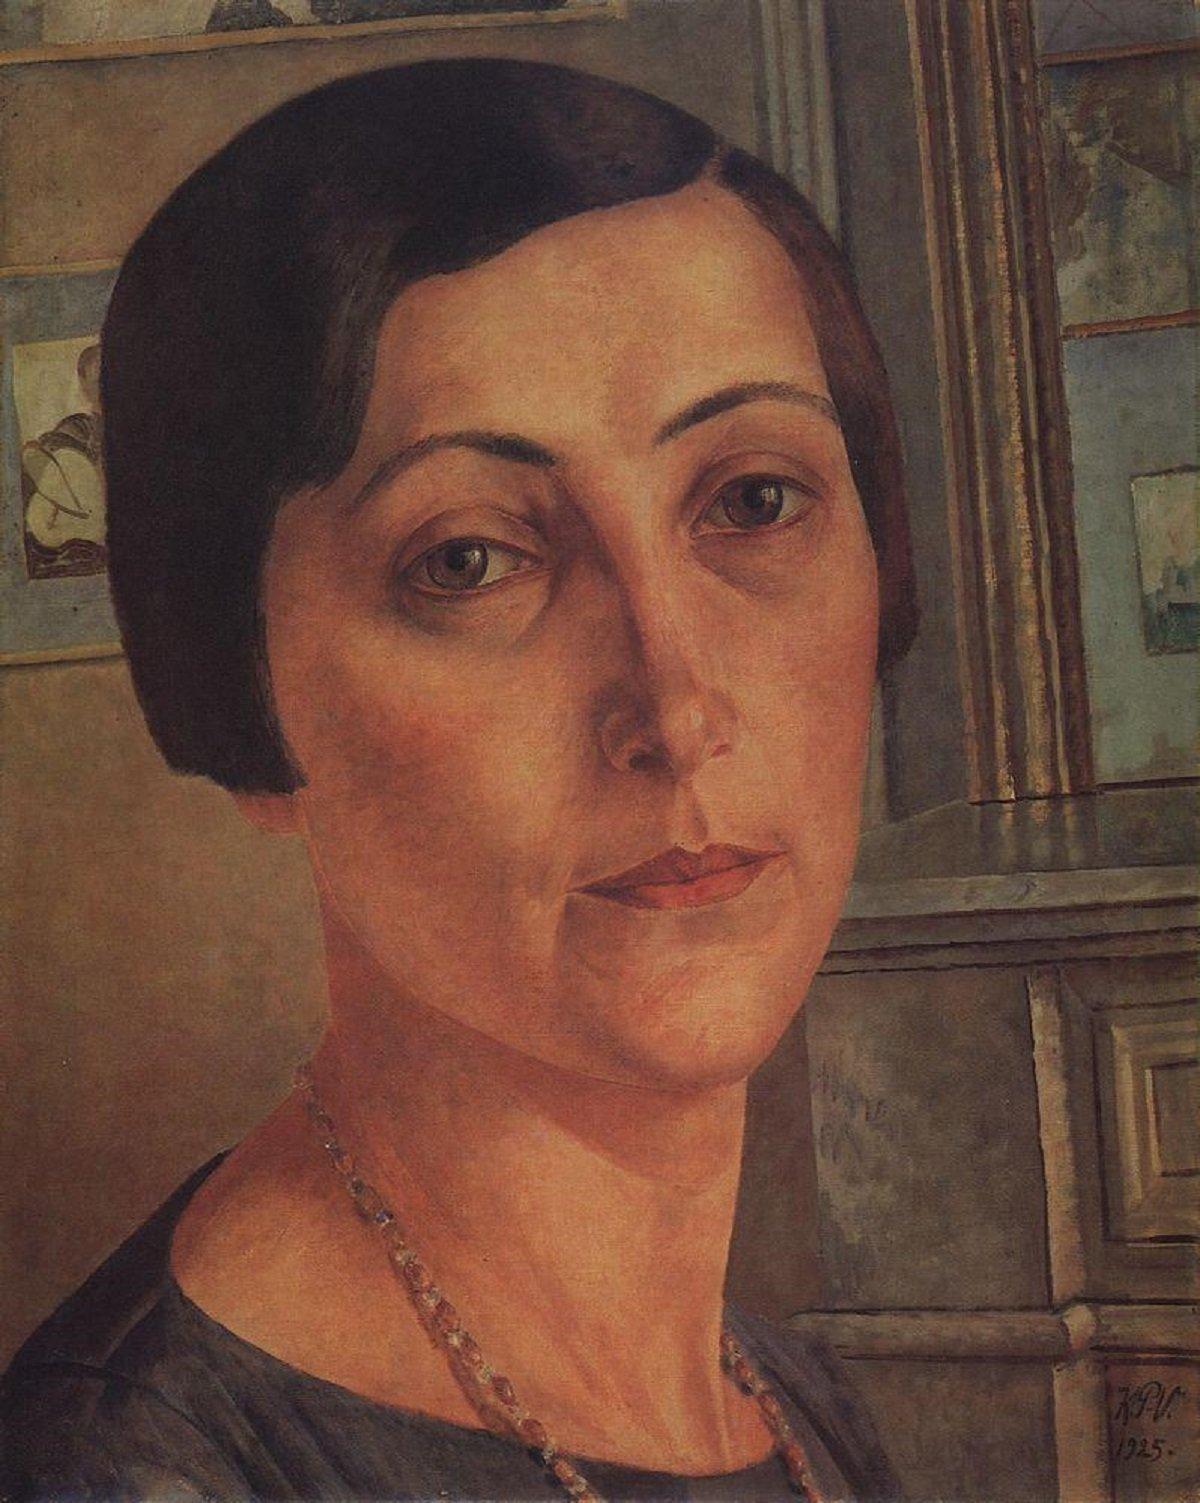 Портрет Саломе Андроникашвили кисти Петрова-Водкина